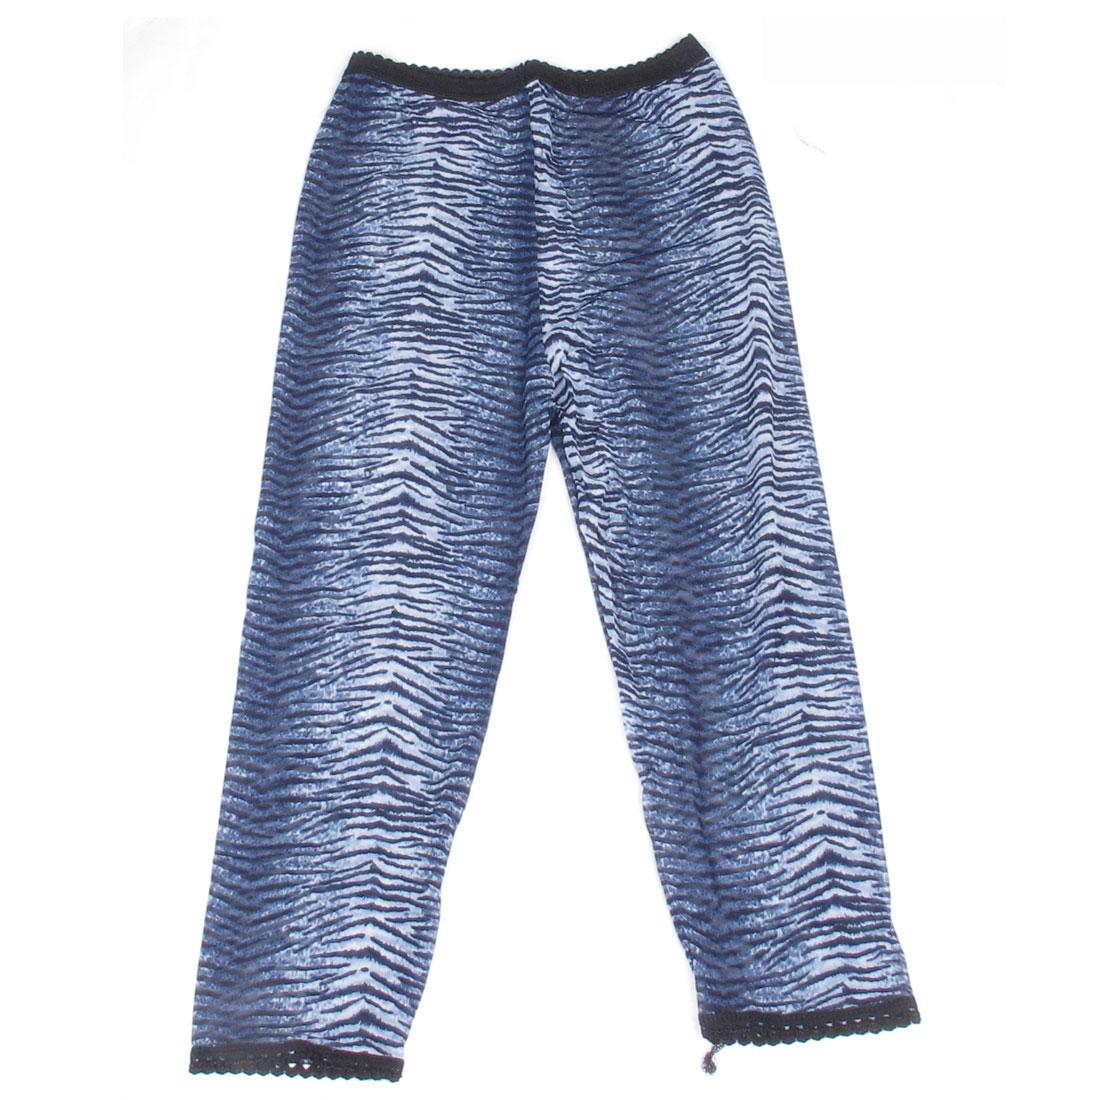 Women Korea Style Laced Cuff Zebra Print Capris Leggings Blue XS